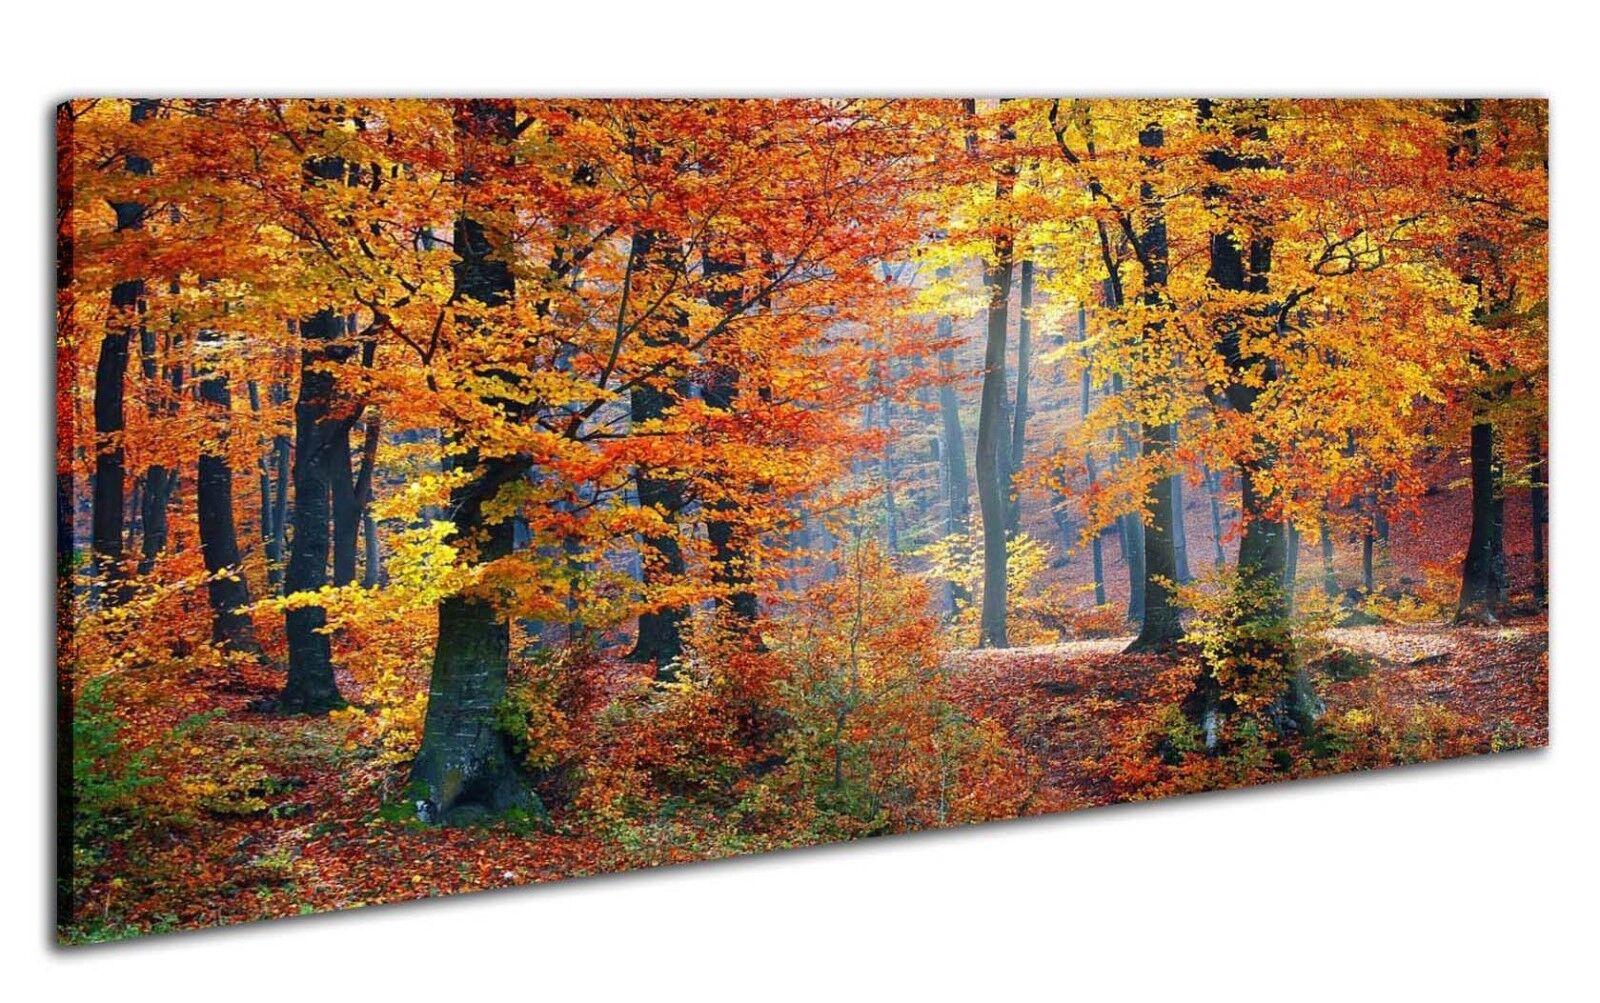 Leinwand Panorama Bild Wandbild Keilrahmenbild Herbst Wald Bäume Blätter Wald Na